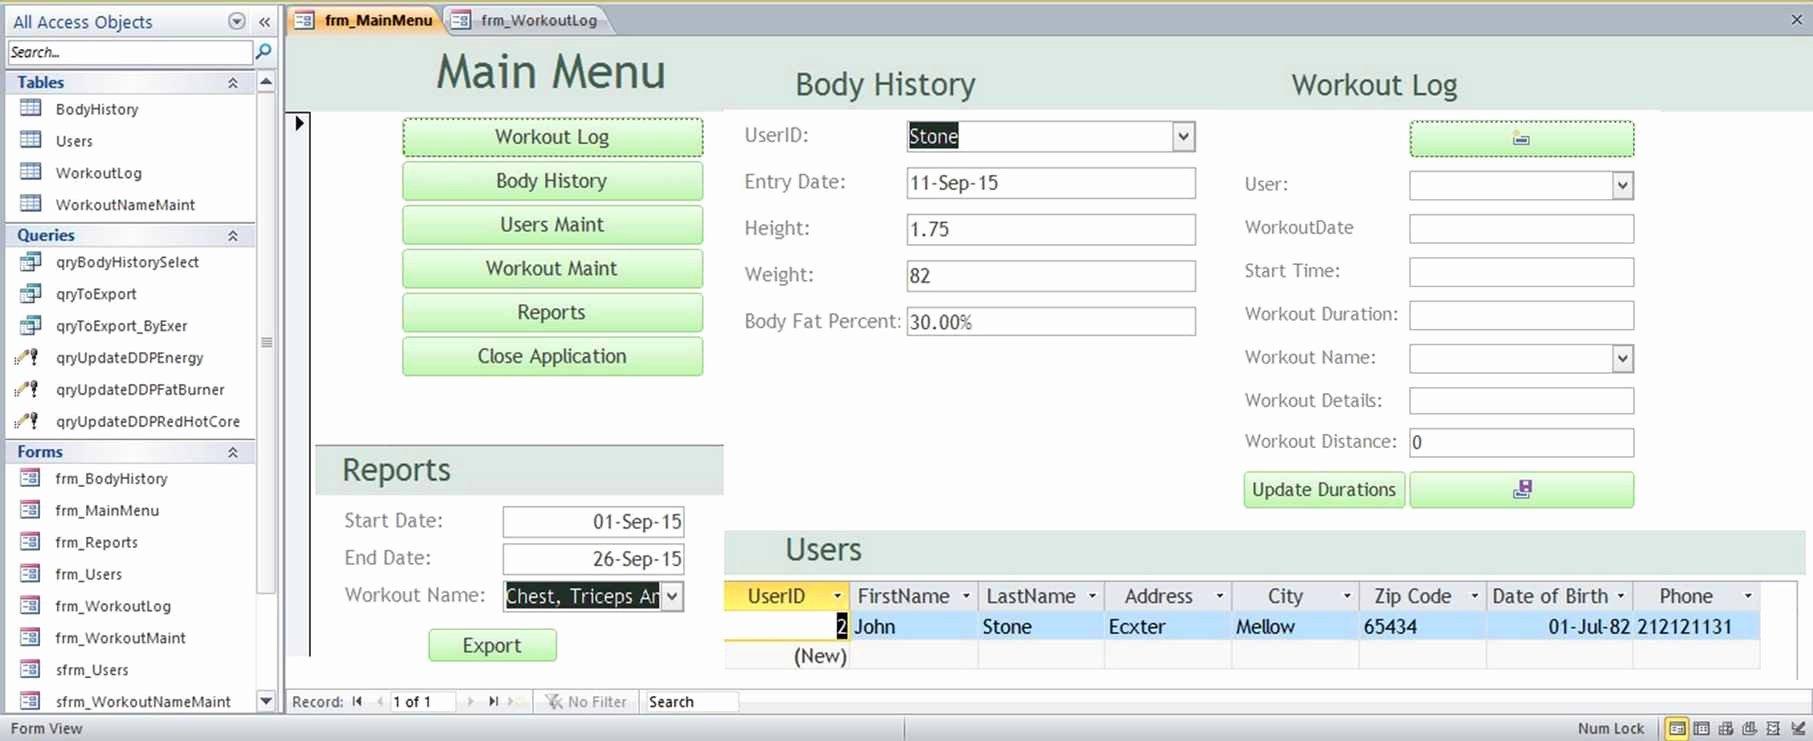 Microsoft Access form Template Elegant Microsoft Access Family Tree Genealogy History Templates